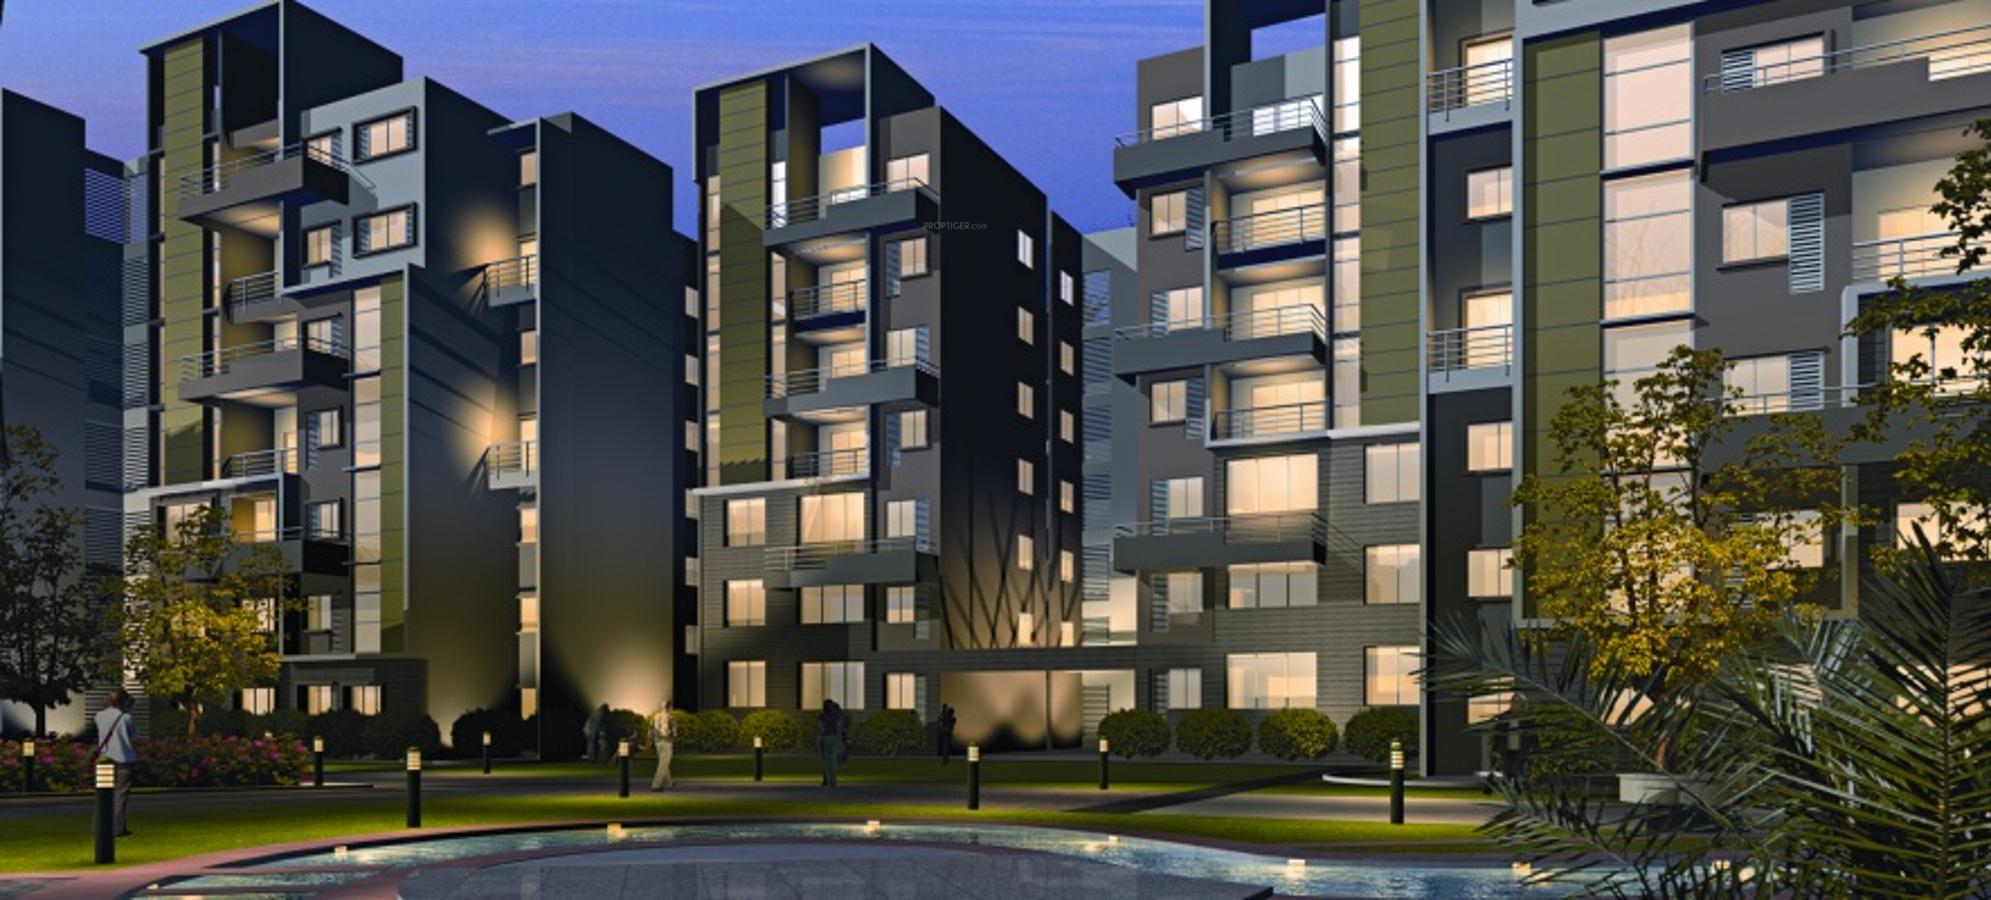 Bren Sjr Luxuria In Jp Nagar Phase 7 Bangalore Price